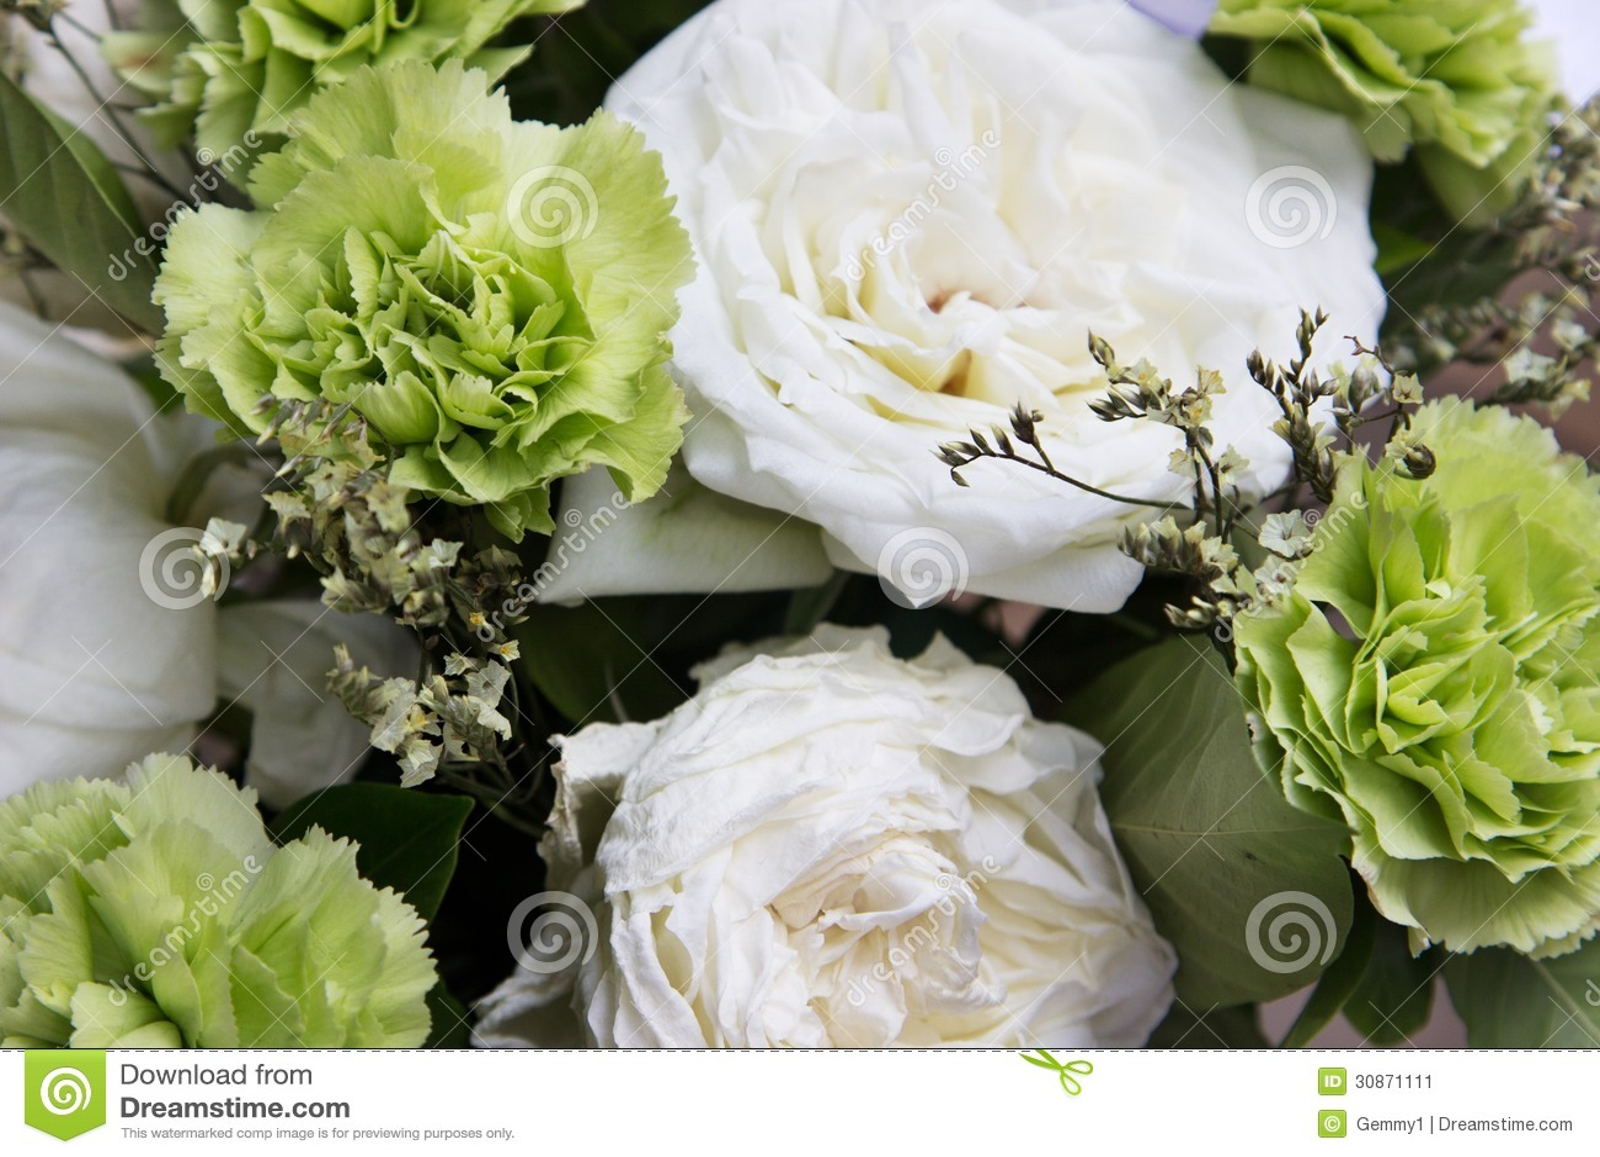 Fiori verdi di nozze immagini for Fiori verdi